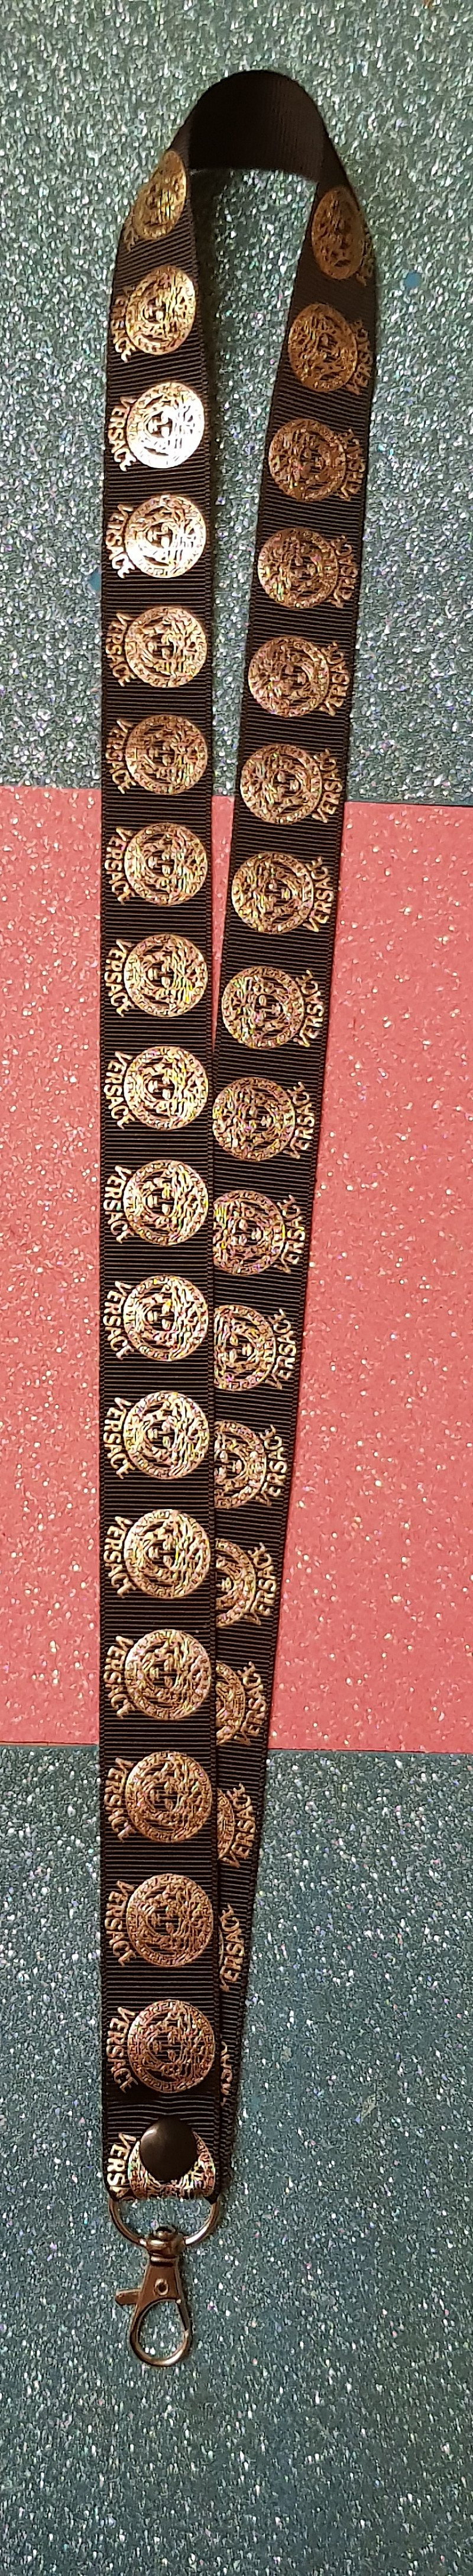 Versace Lanyard Id Badge Holder